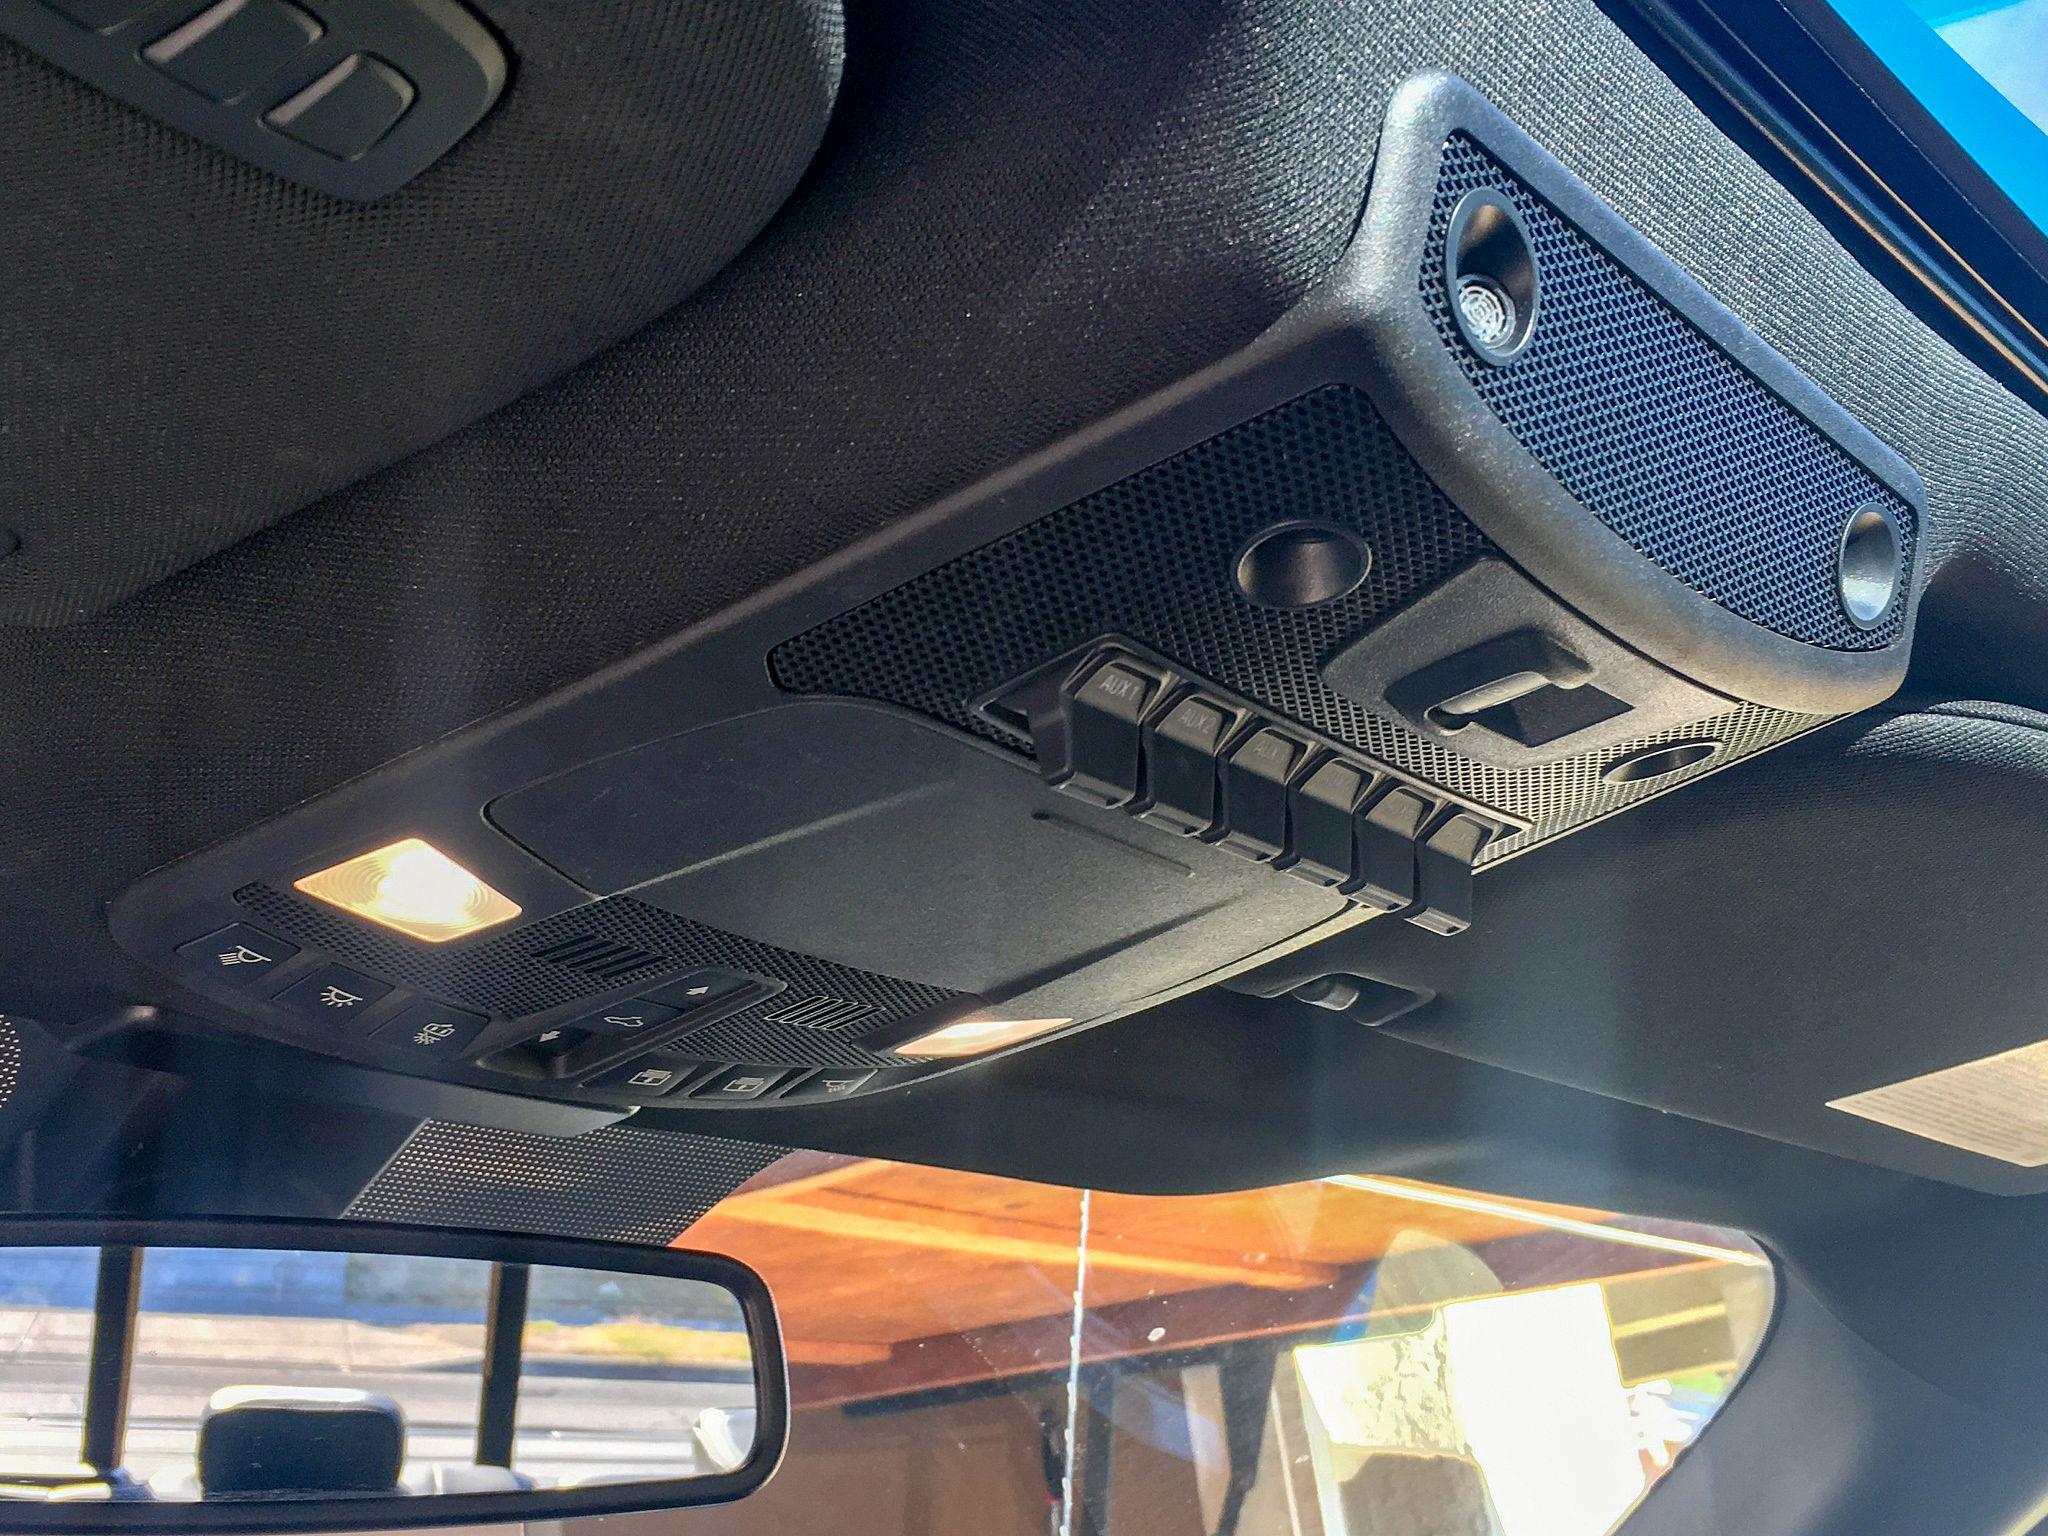 F-150 Upfitter Switches